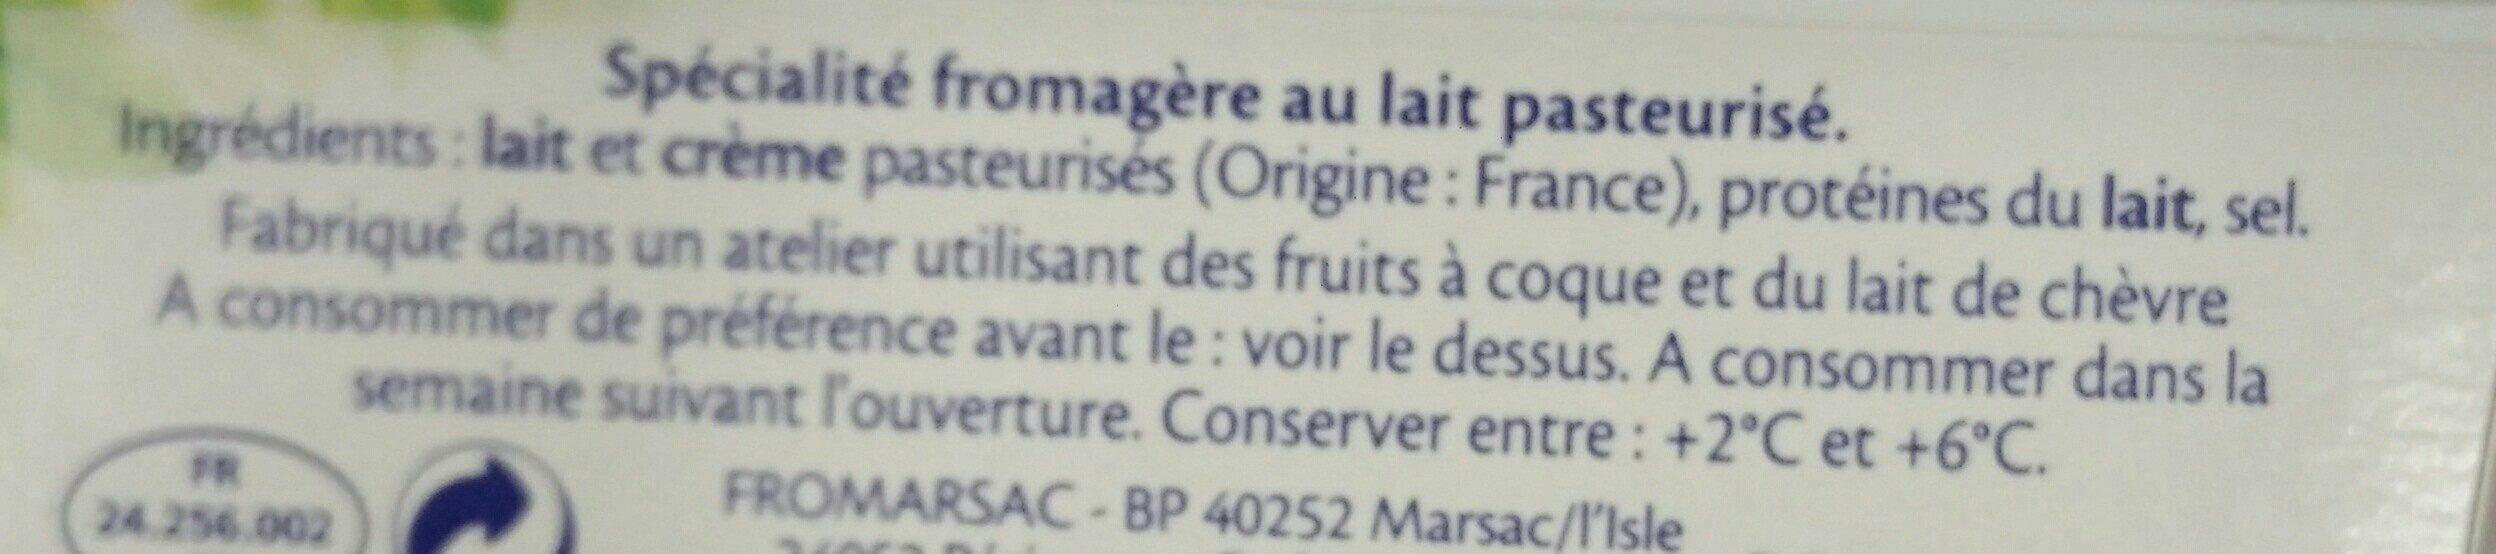 Spécialité fromagère nature (-25% sel) - Ingrediënten - fr